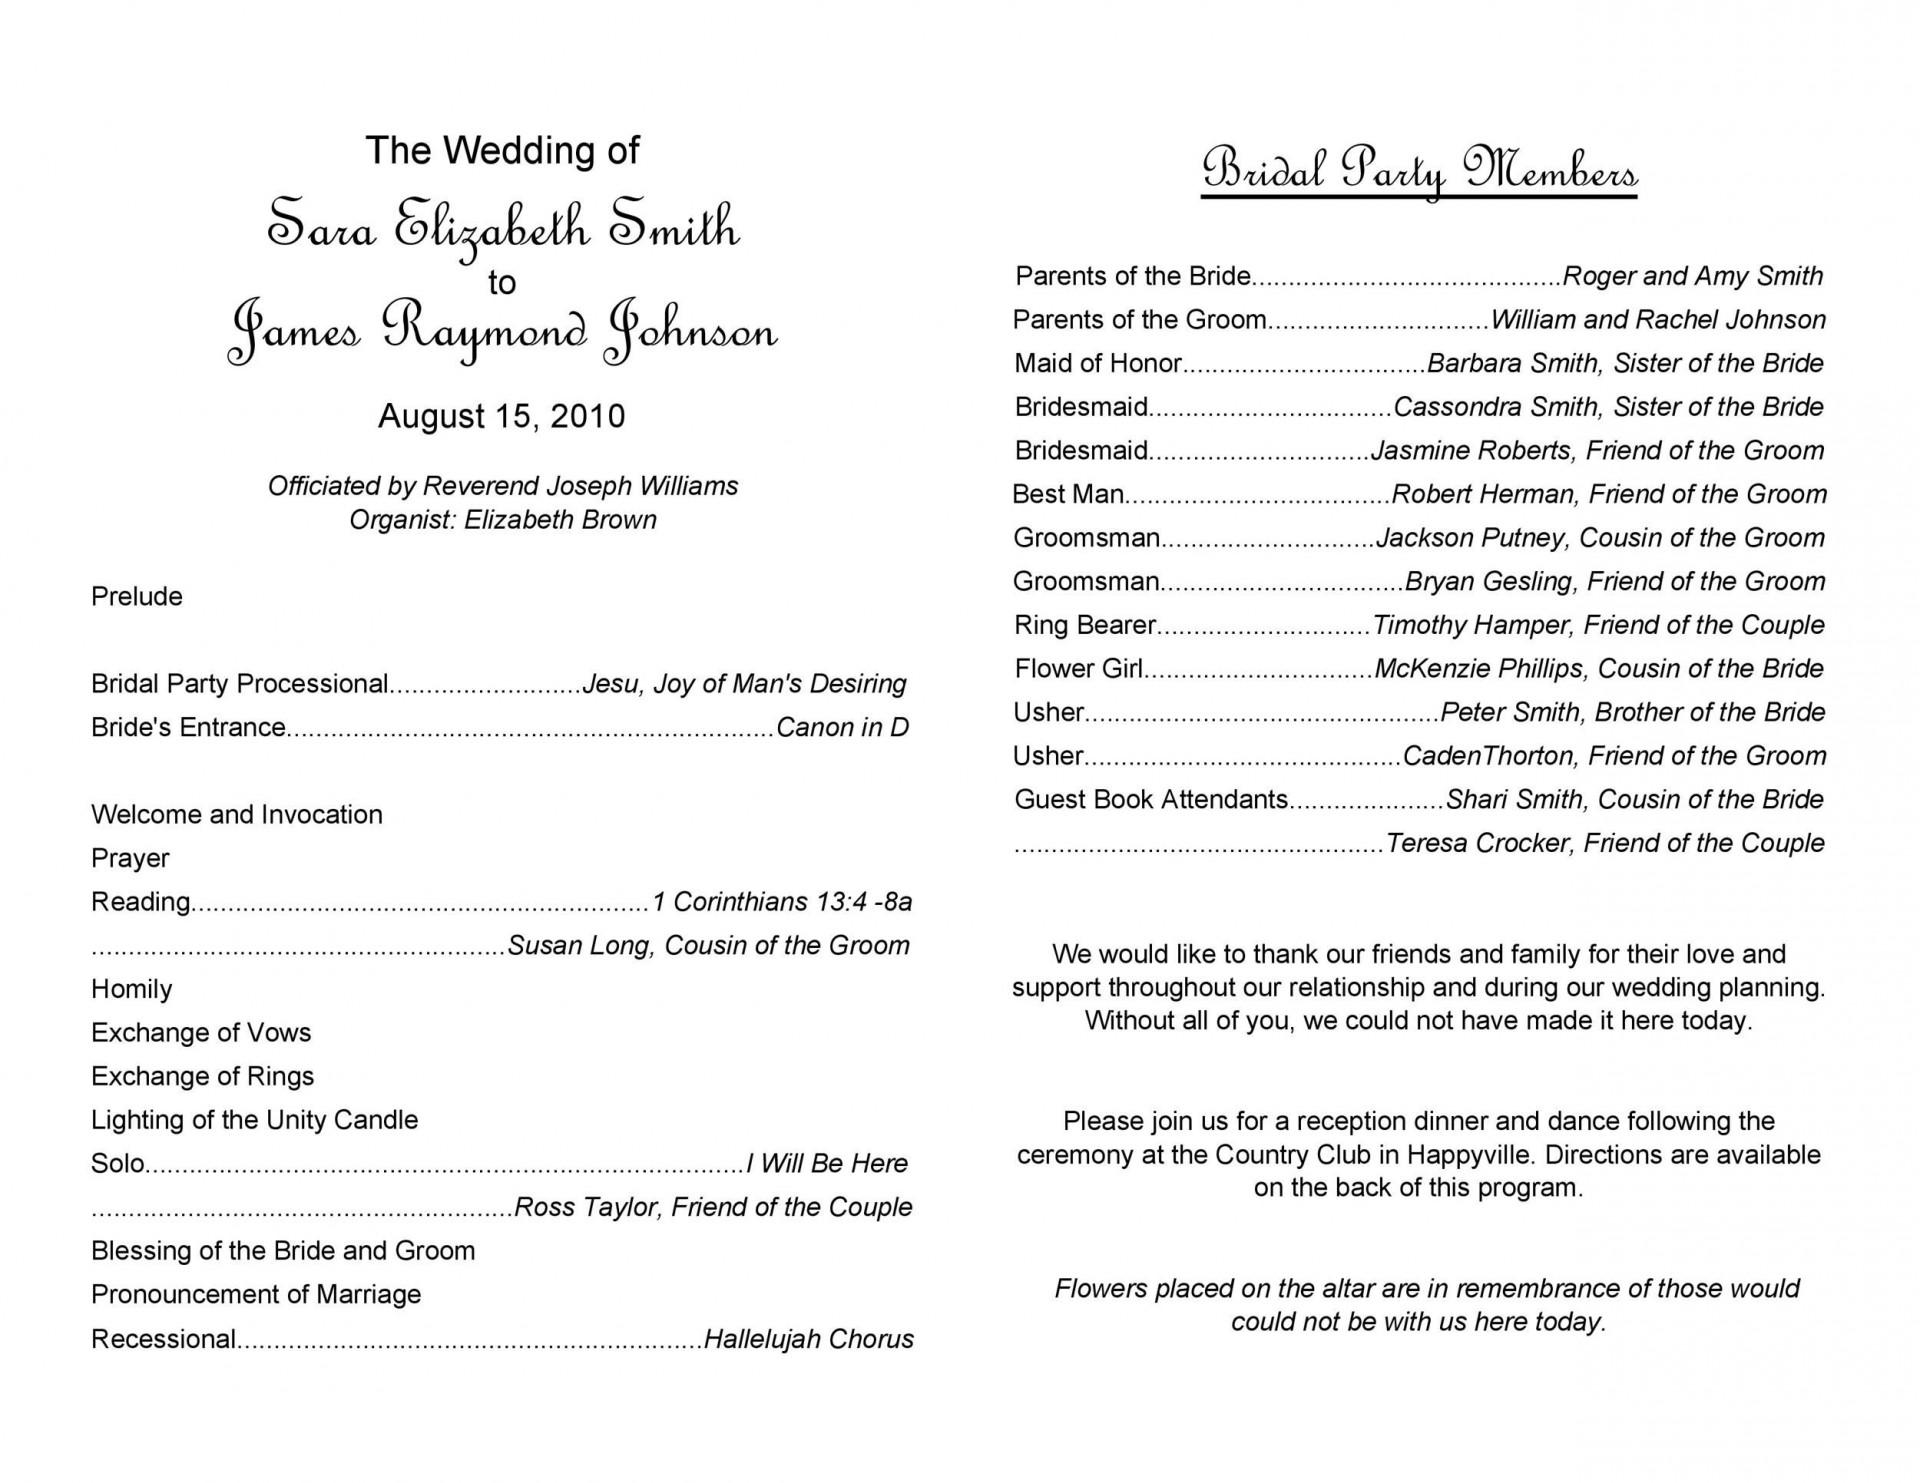 010 Beautiful Wedding Program Template Word Example  Catholic Mas Sample Wording Idea Simple1920